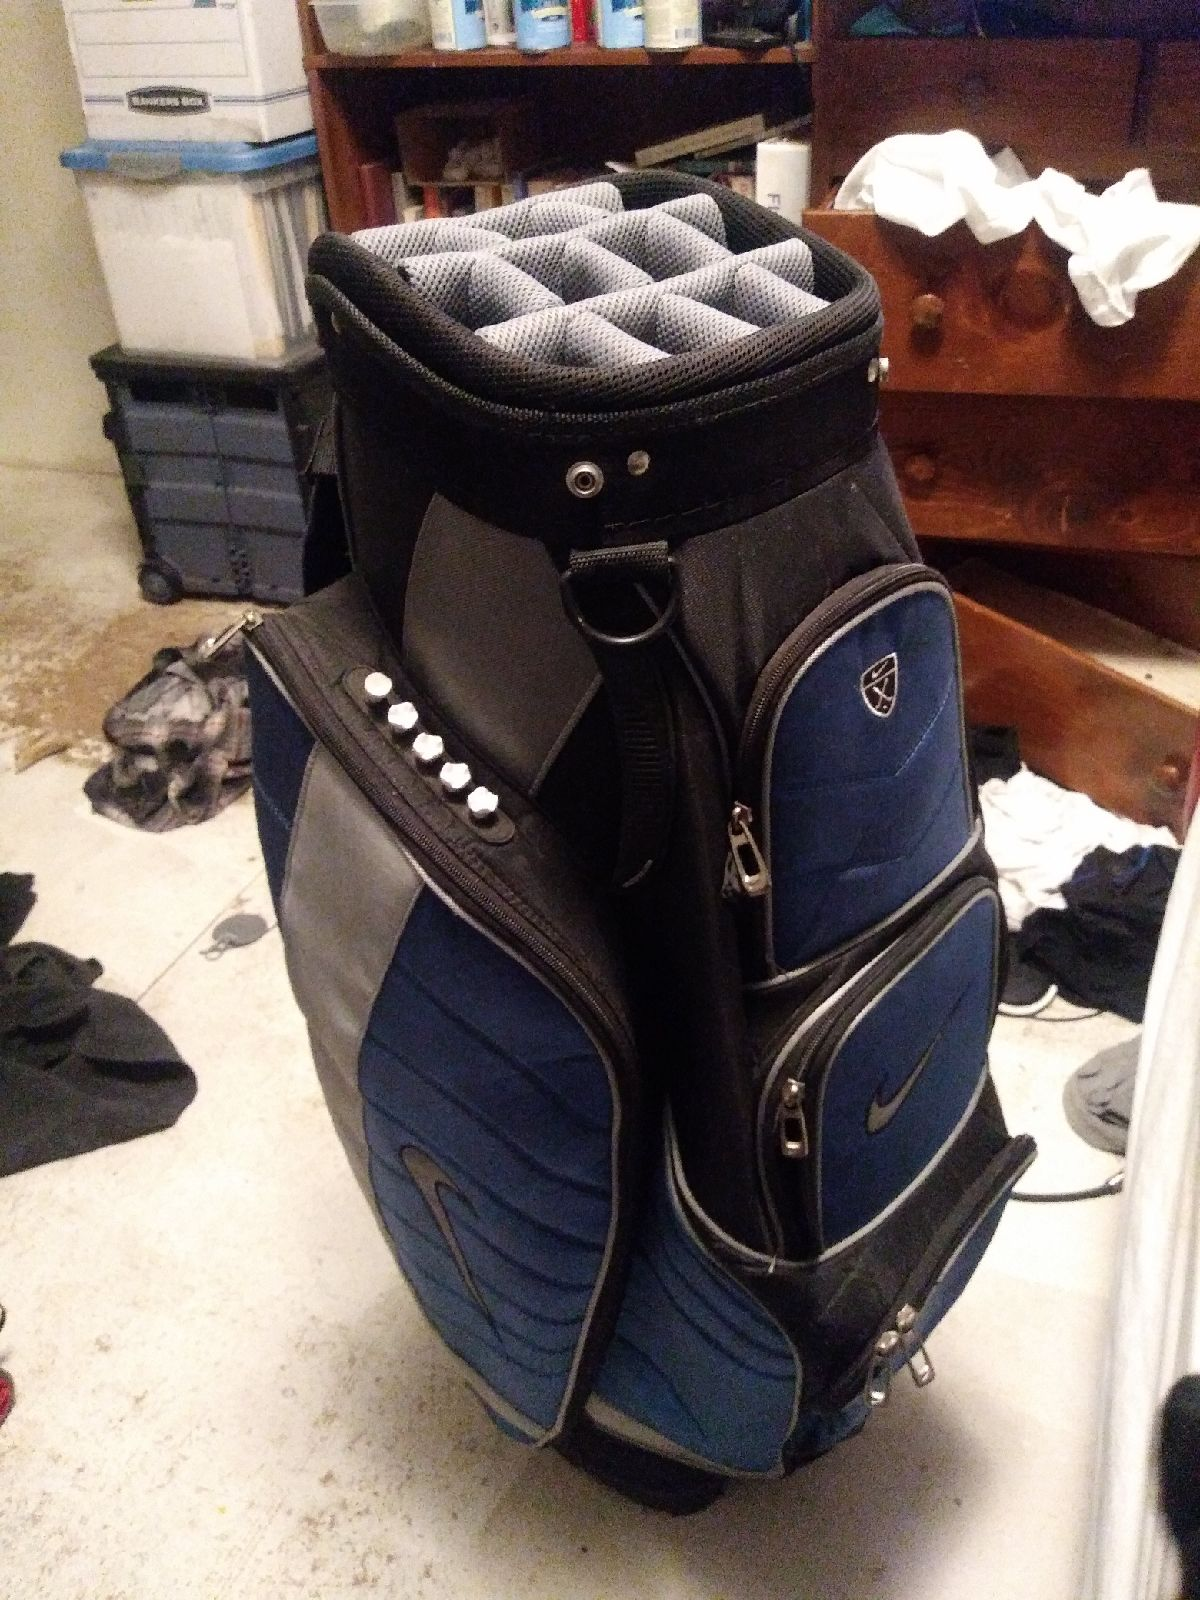 Nike Golf bag 14 compartment